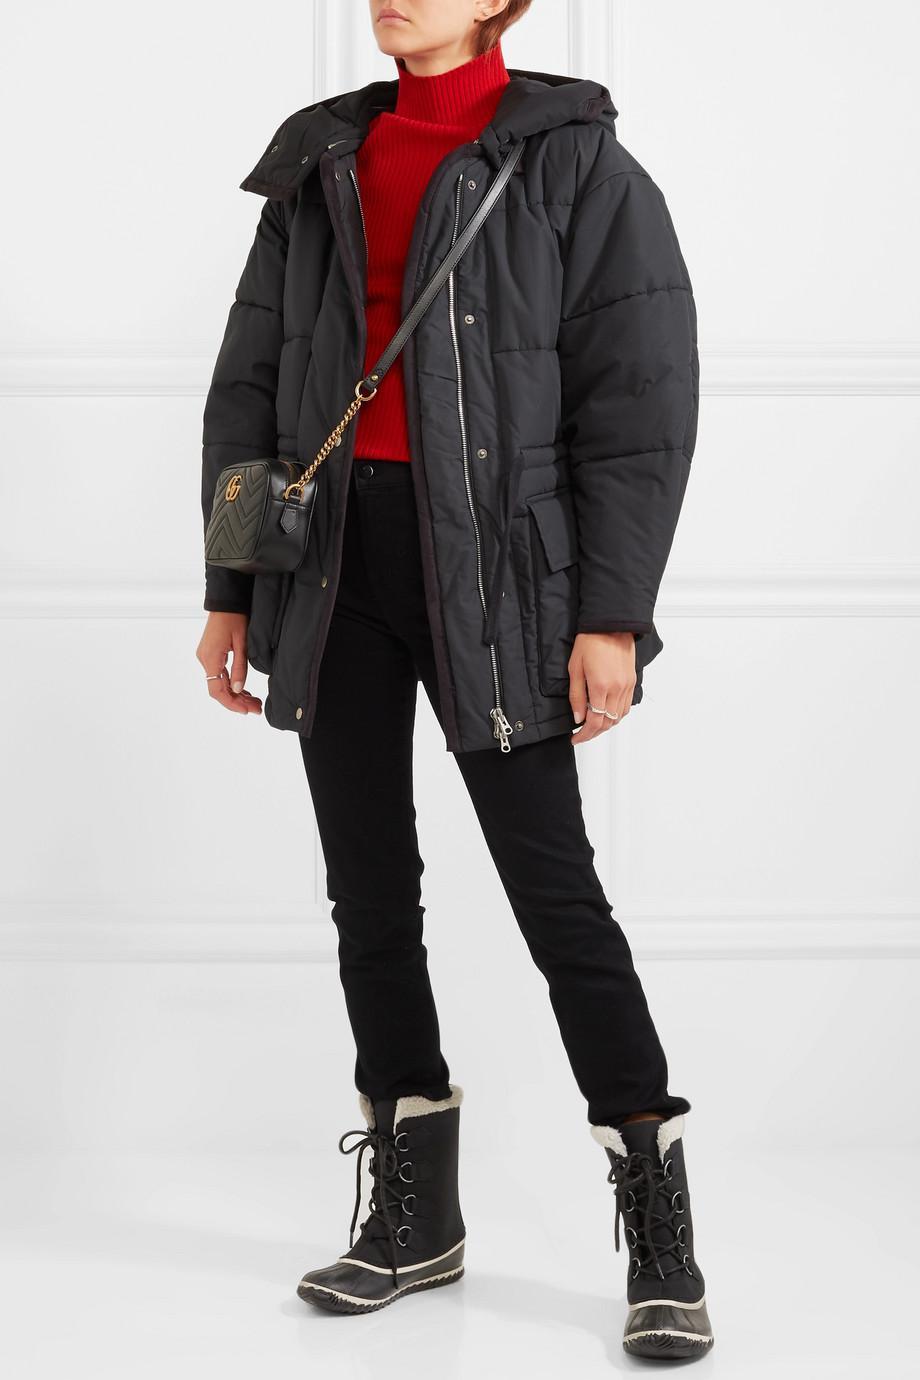 best cheap performance sportswear new appearance Sorel Caribou Slim Waterproof Nubuck And Rubber Boots in Black - Lyst